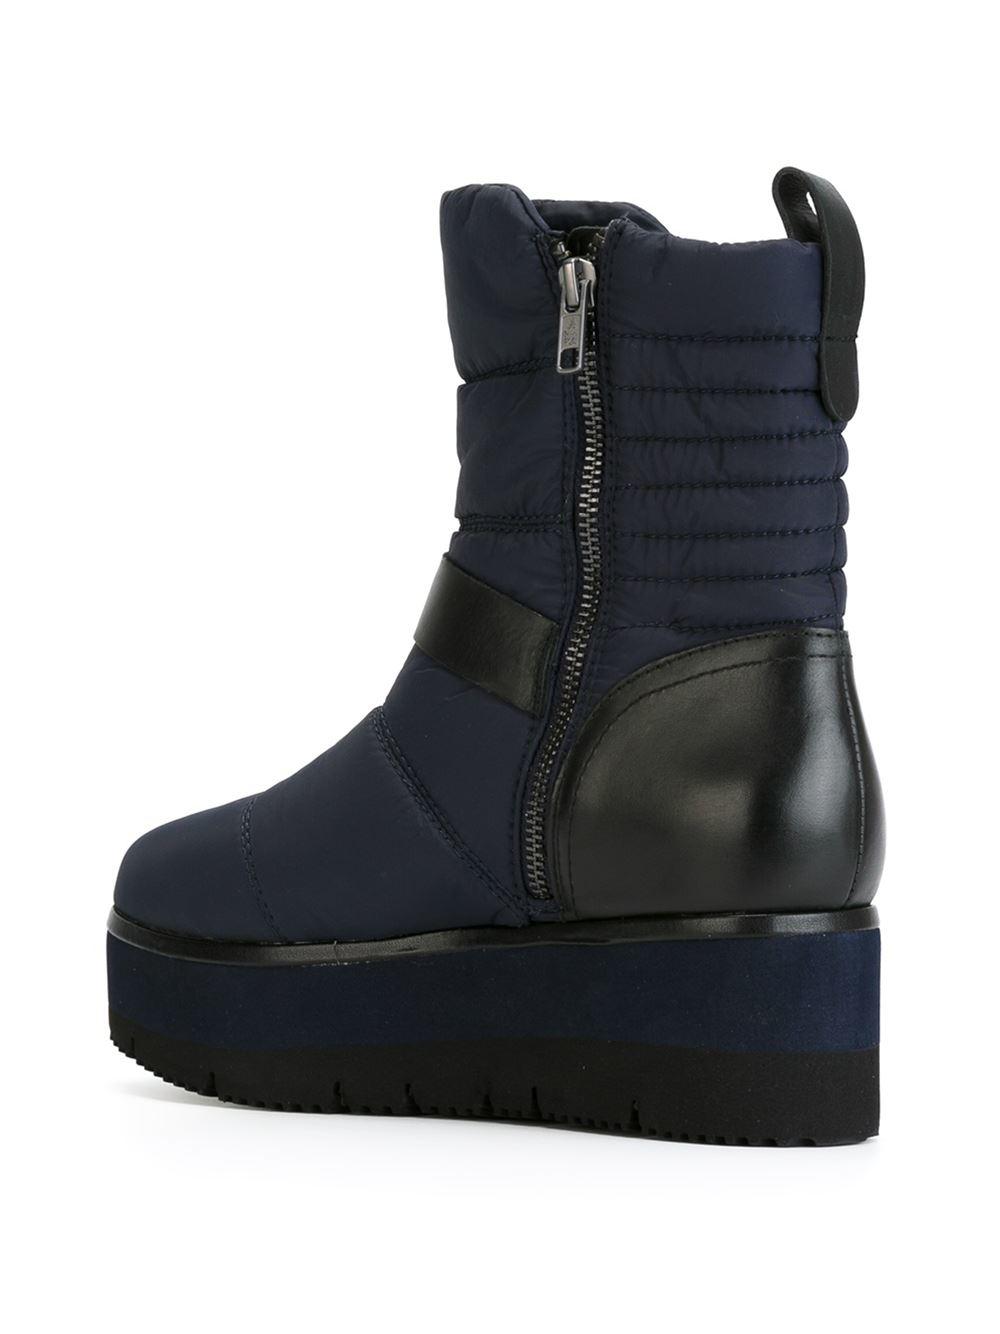 99959998fd81 Lyst ash zelda boots in blue jpg 1000x1334 Ash zelda